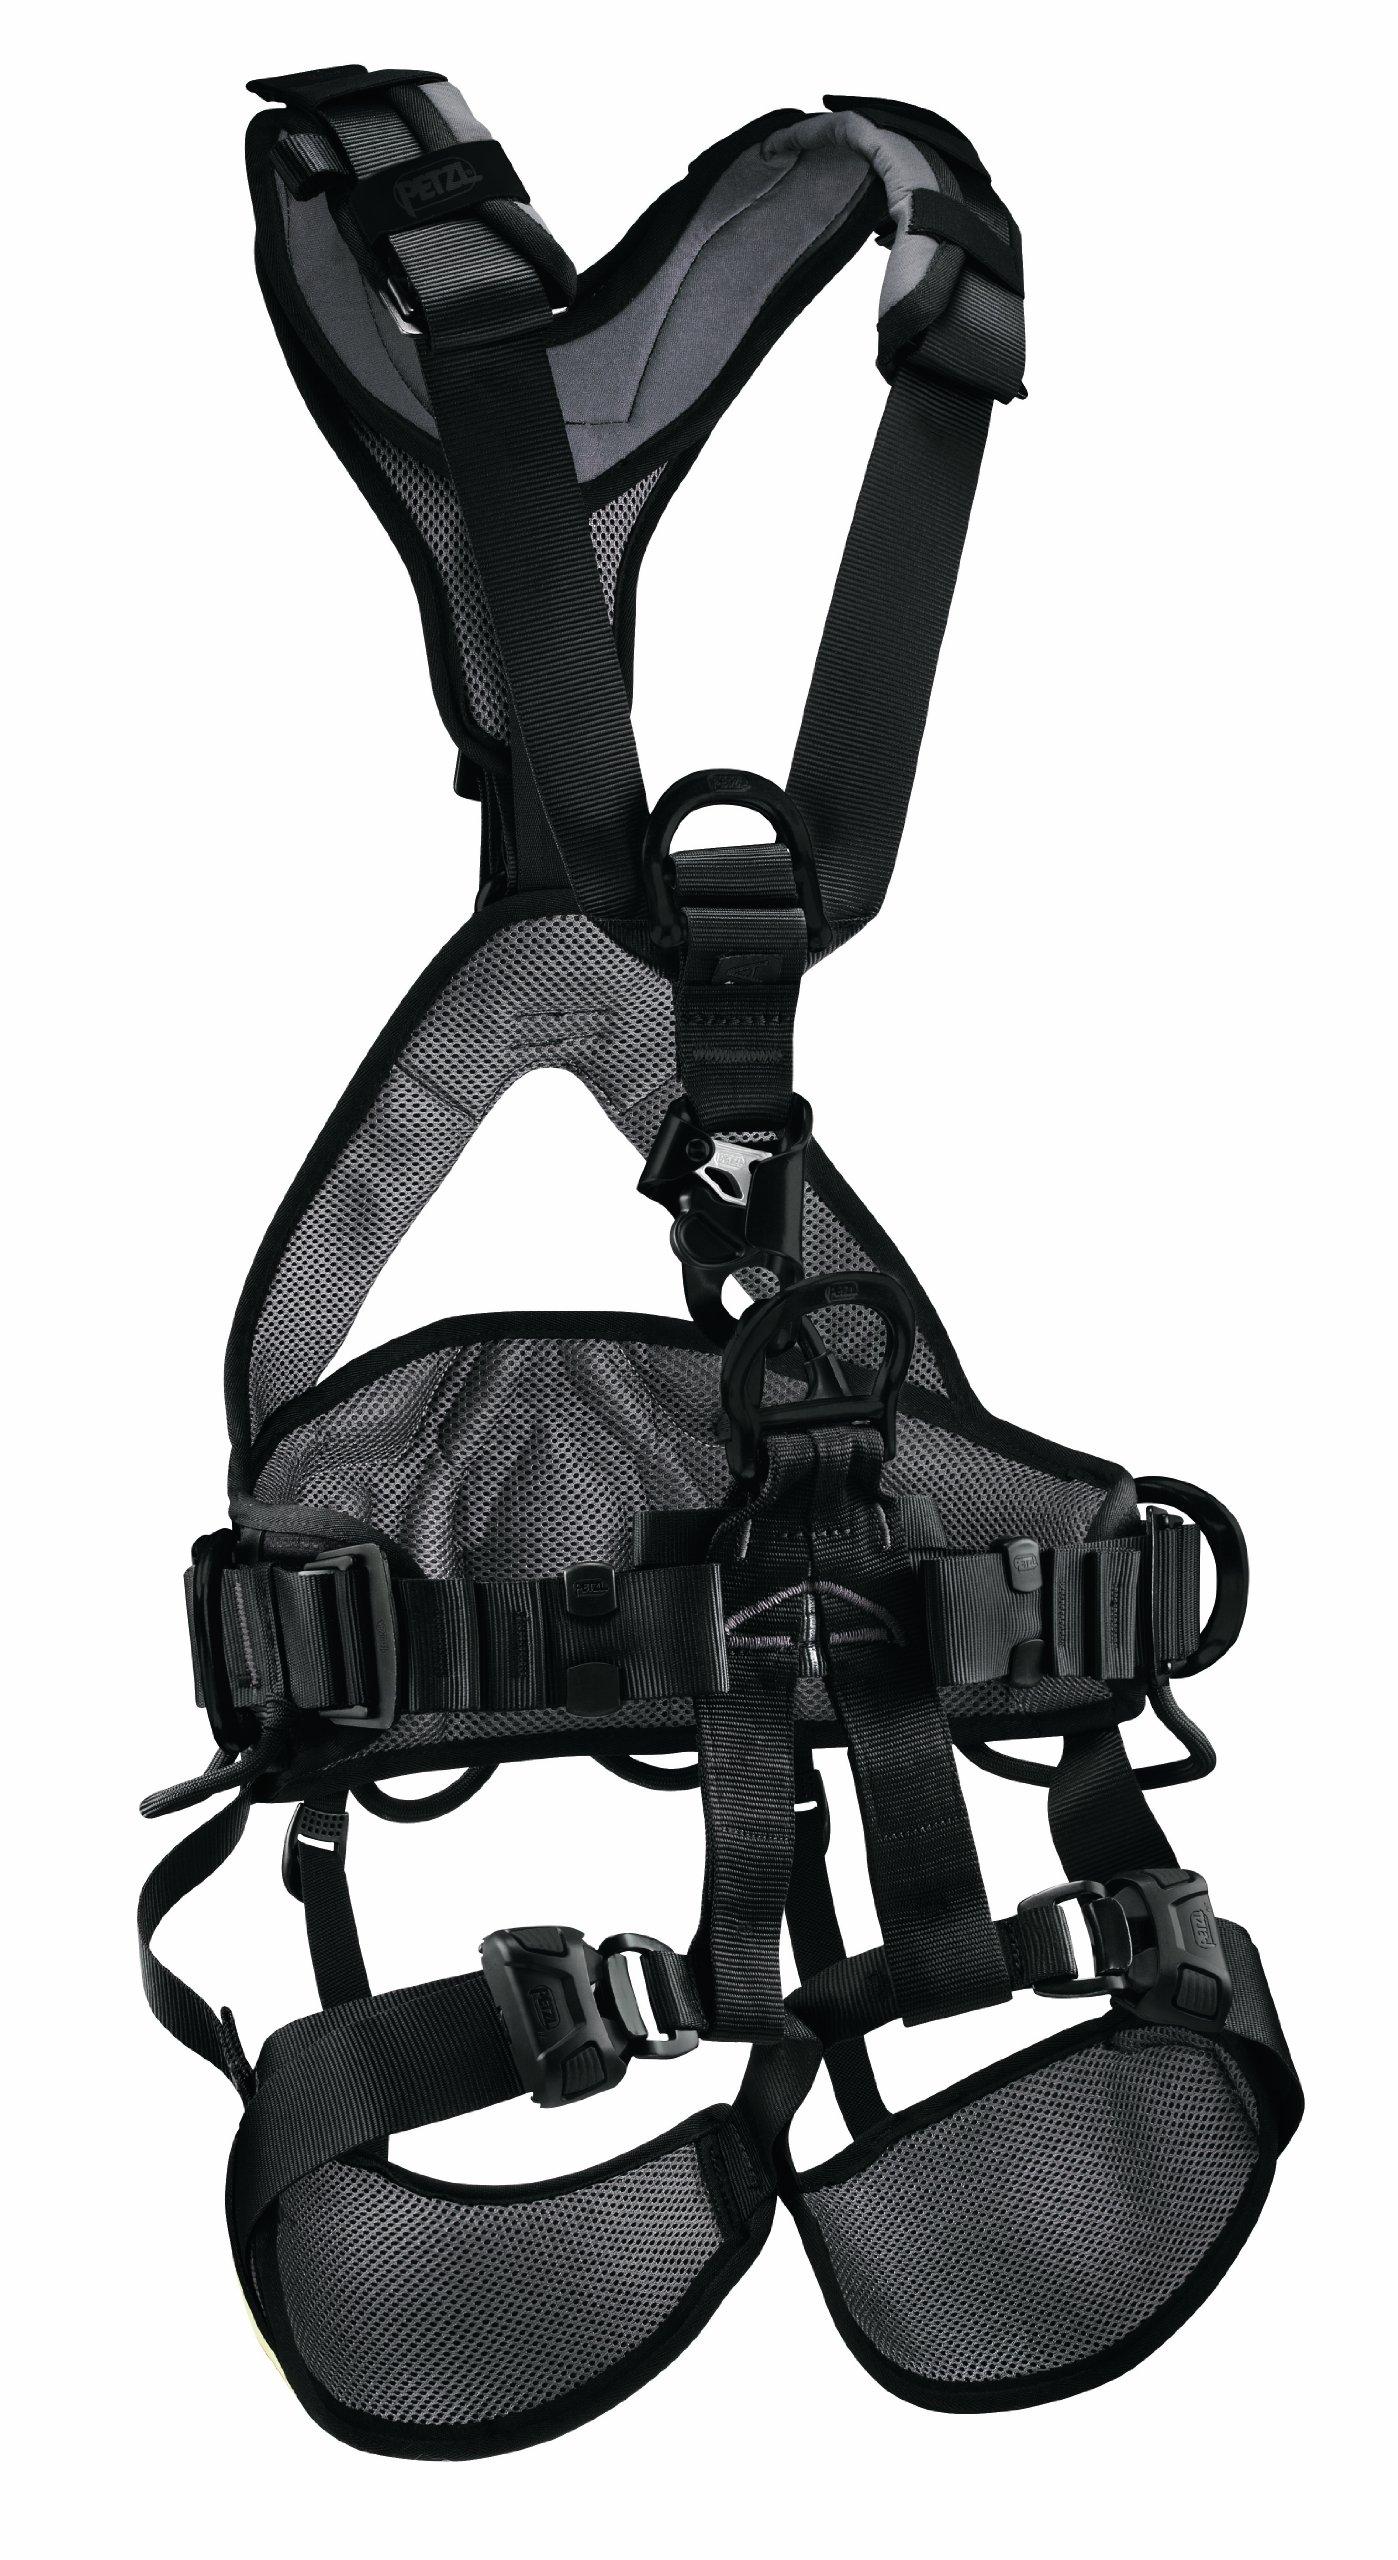 Petzl Pro Avao Bod Croll Fast Harness - Black Size 2 by Petzl